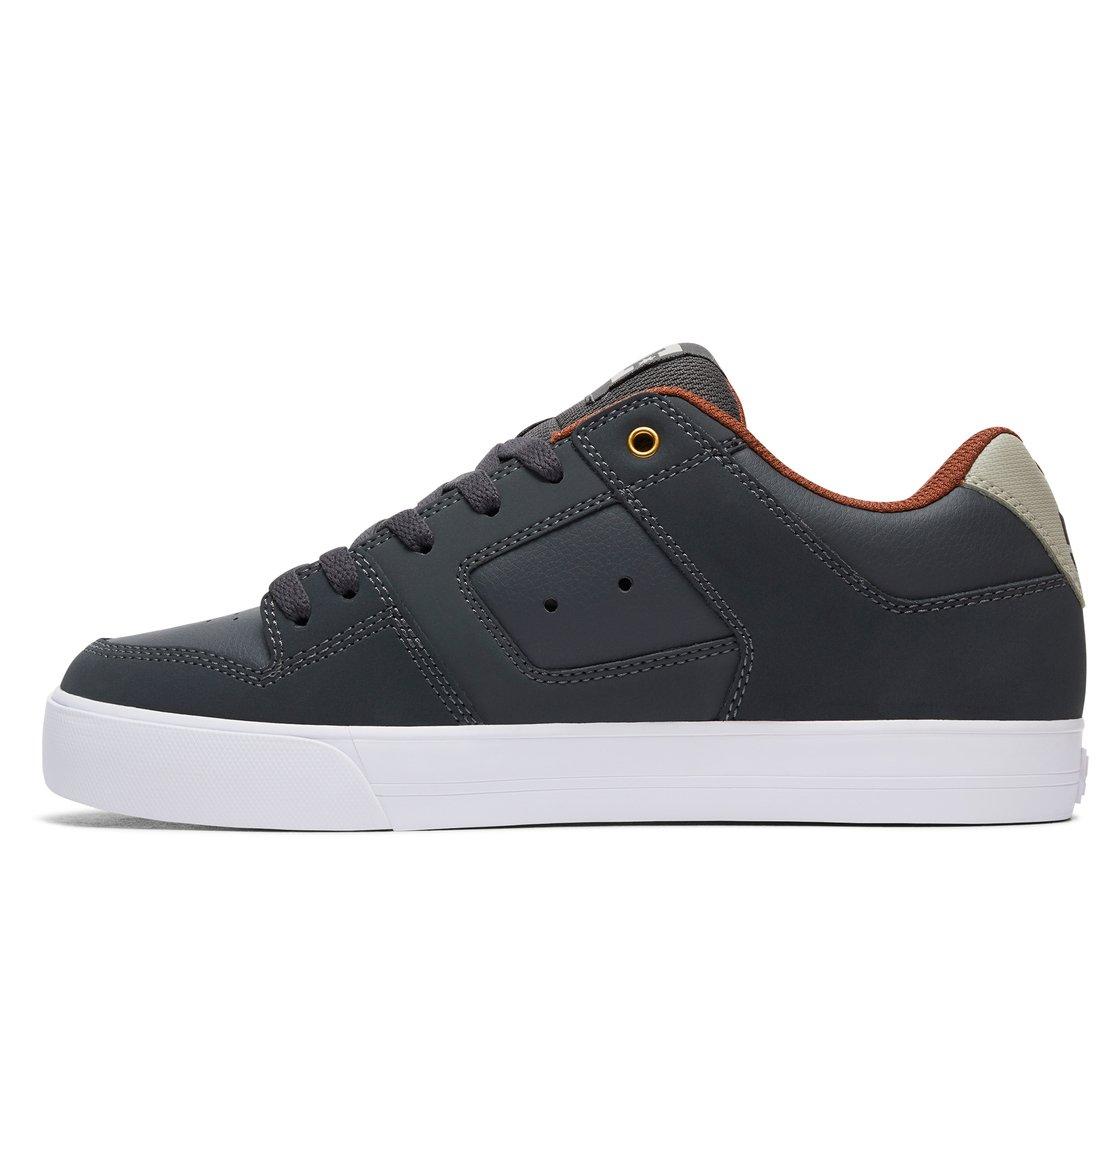 Meridian - Baskets - Gris - DC Shoes nhg58Pm